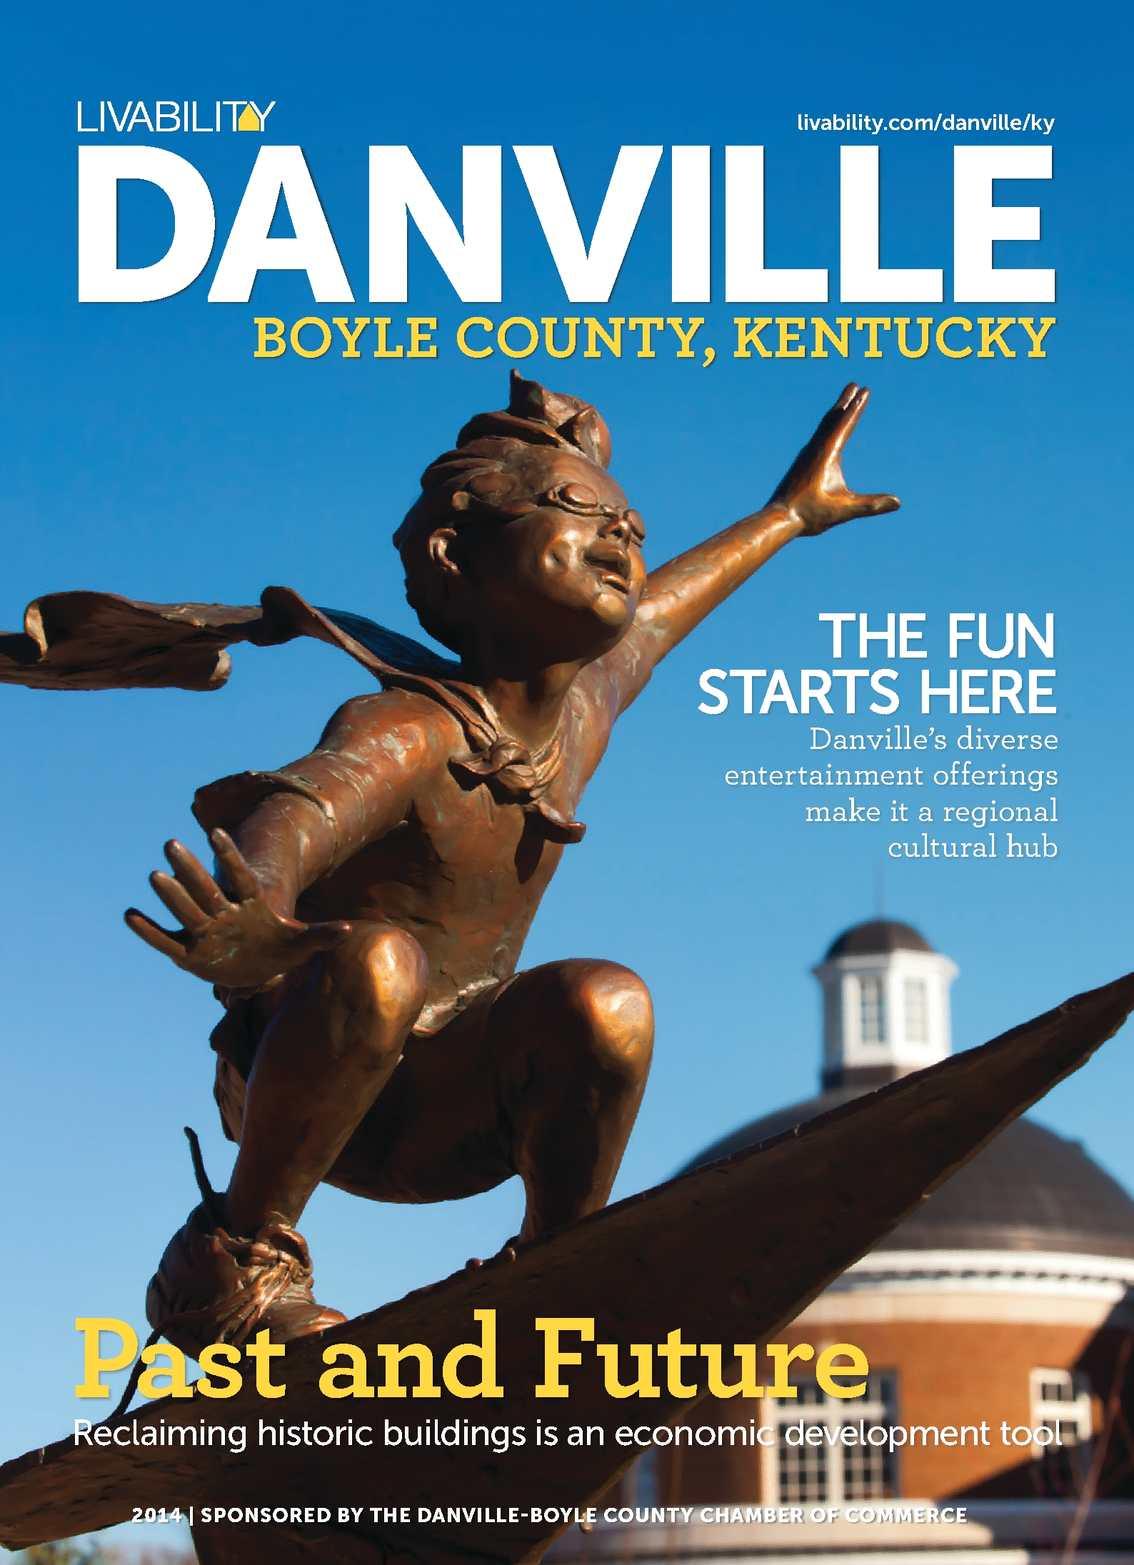 Calamo Livability Danville Boyle County Ky 2014